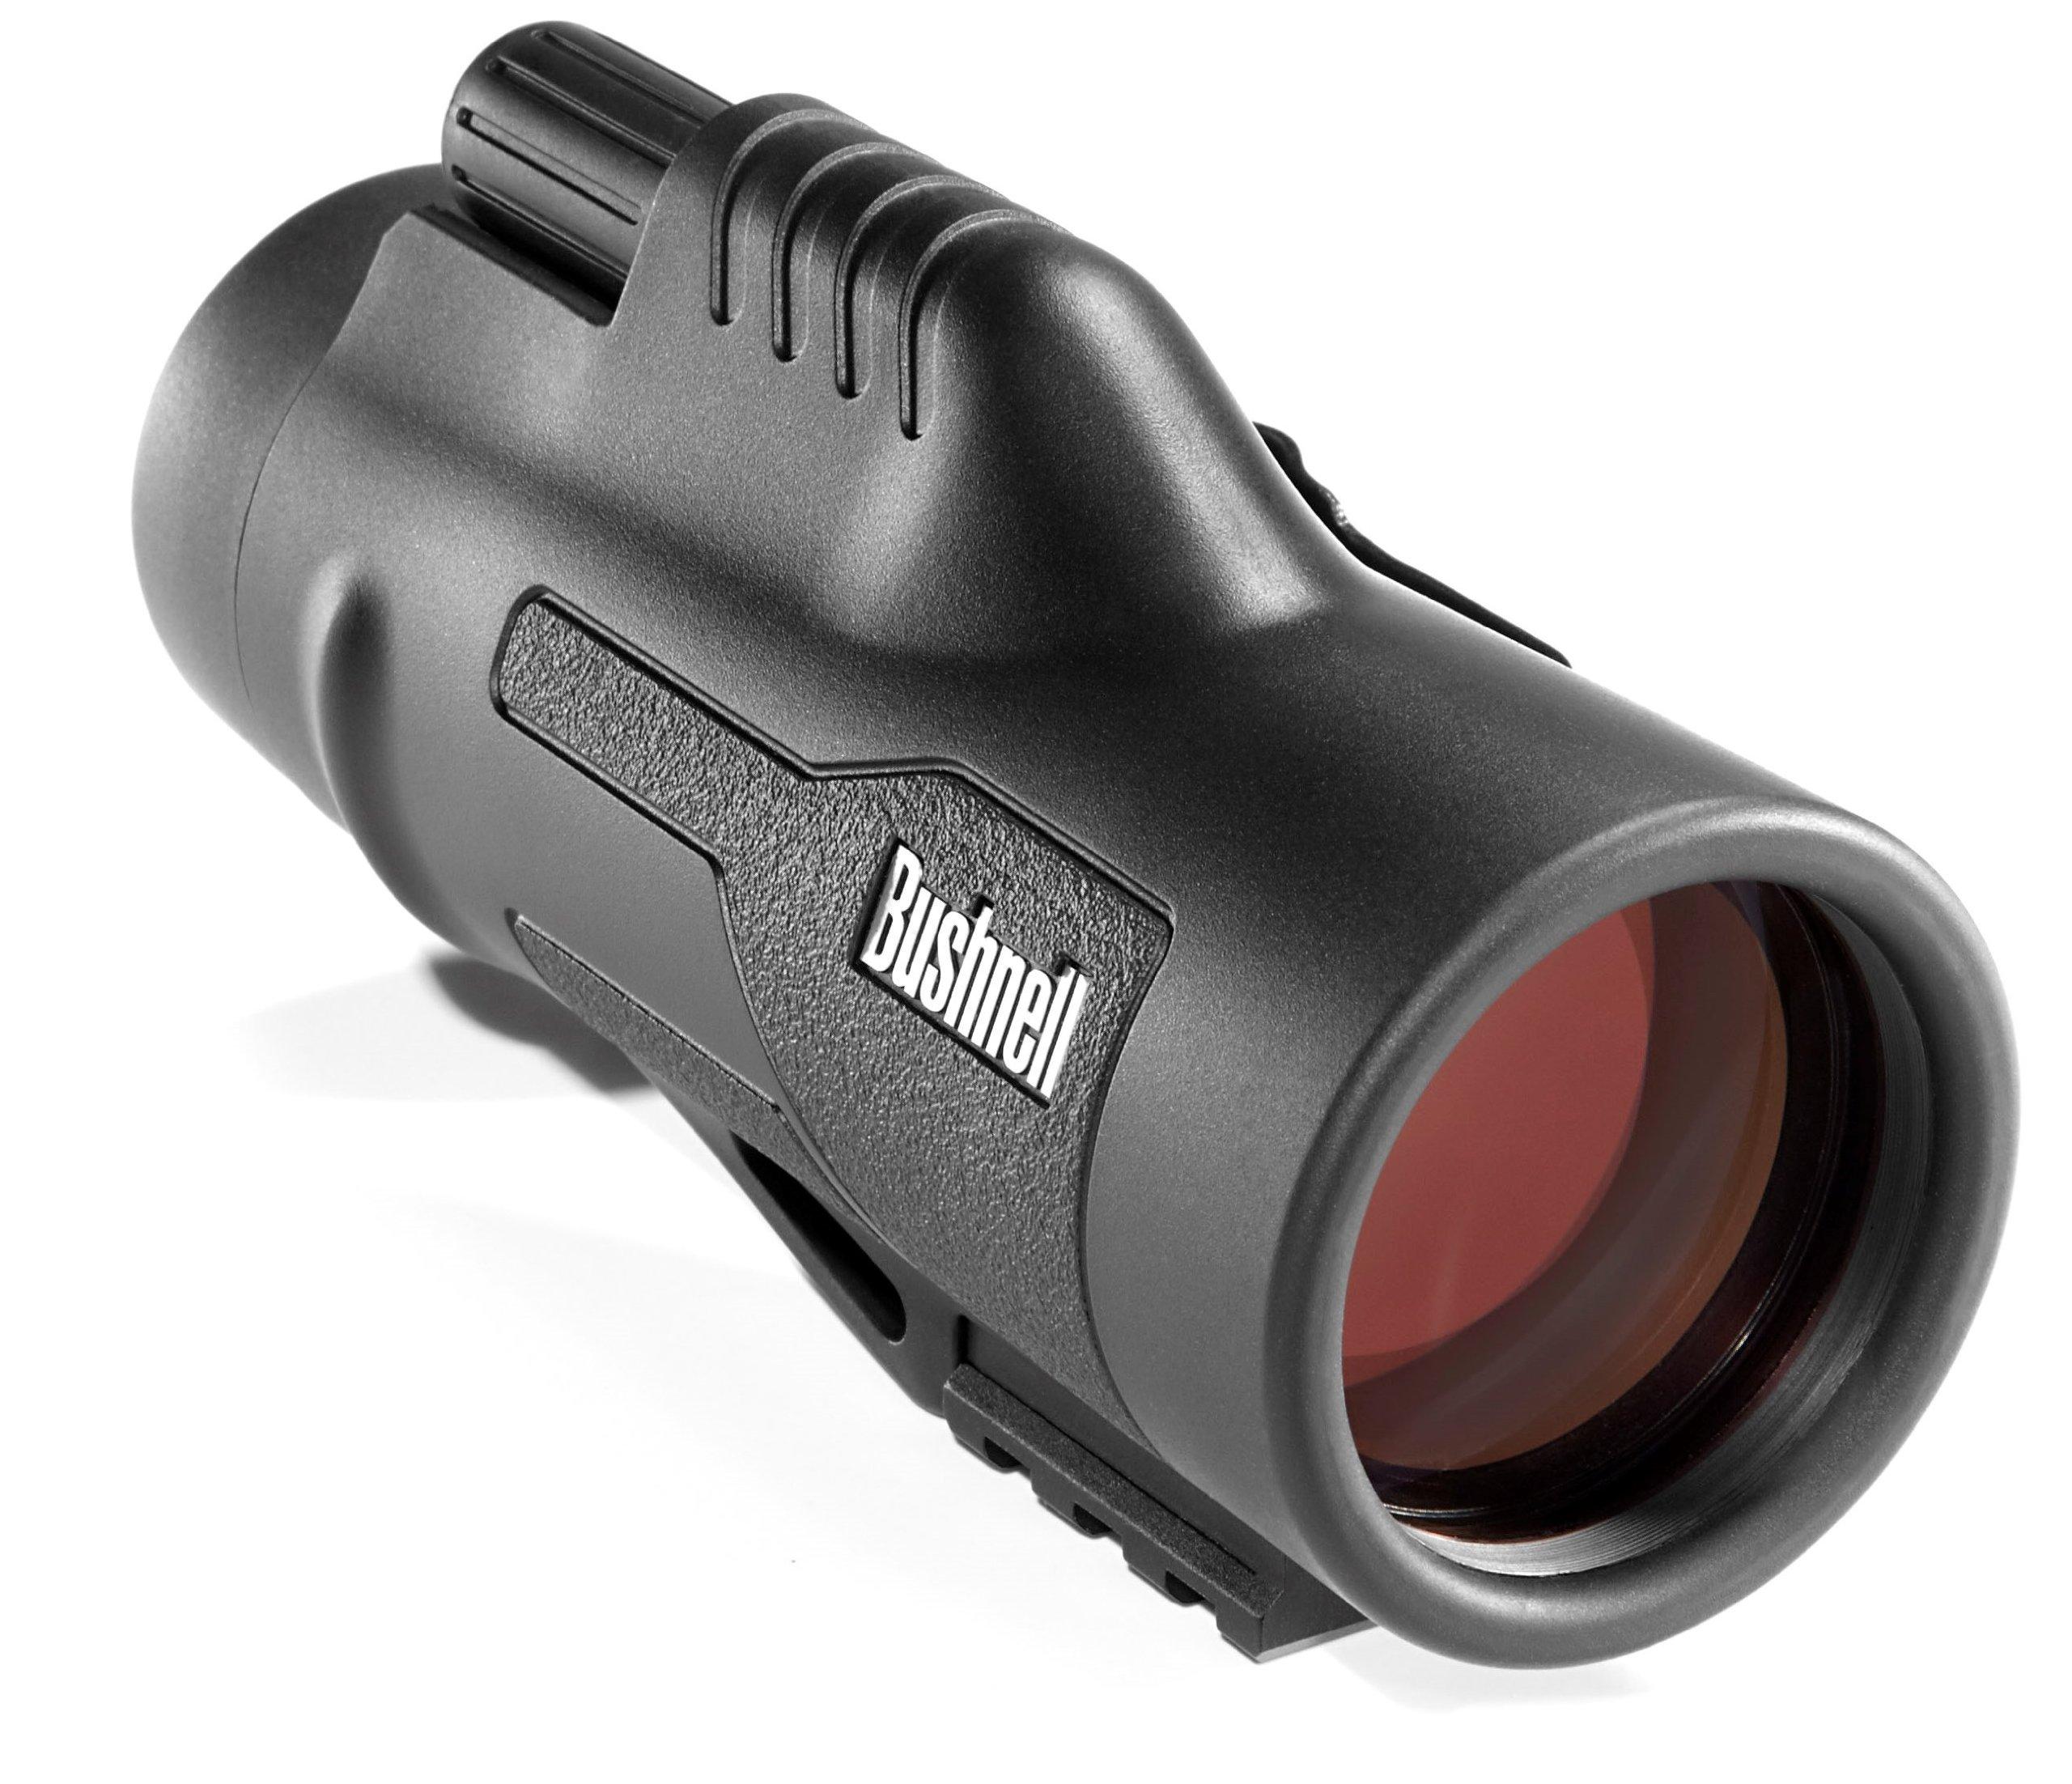 Bushnell Legend Ultra HD Monocular, Black, 10 x 42-mm by Bushnell